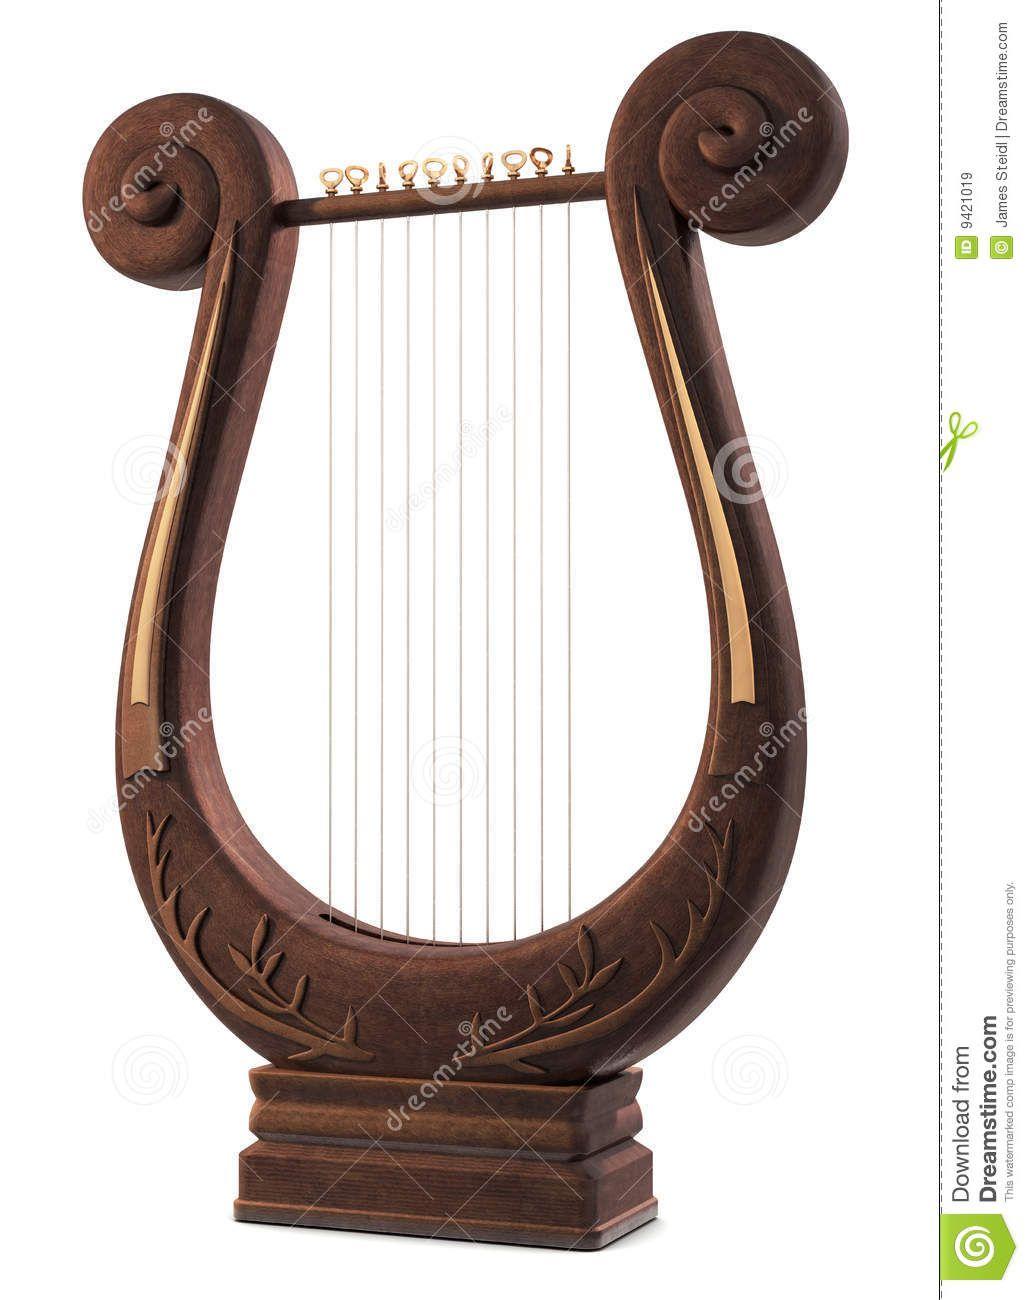 Uno strumento musicale del Lyre su bianco.